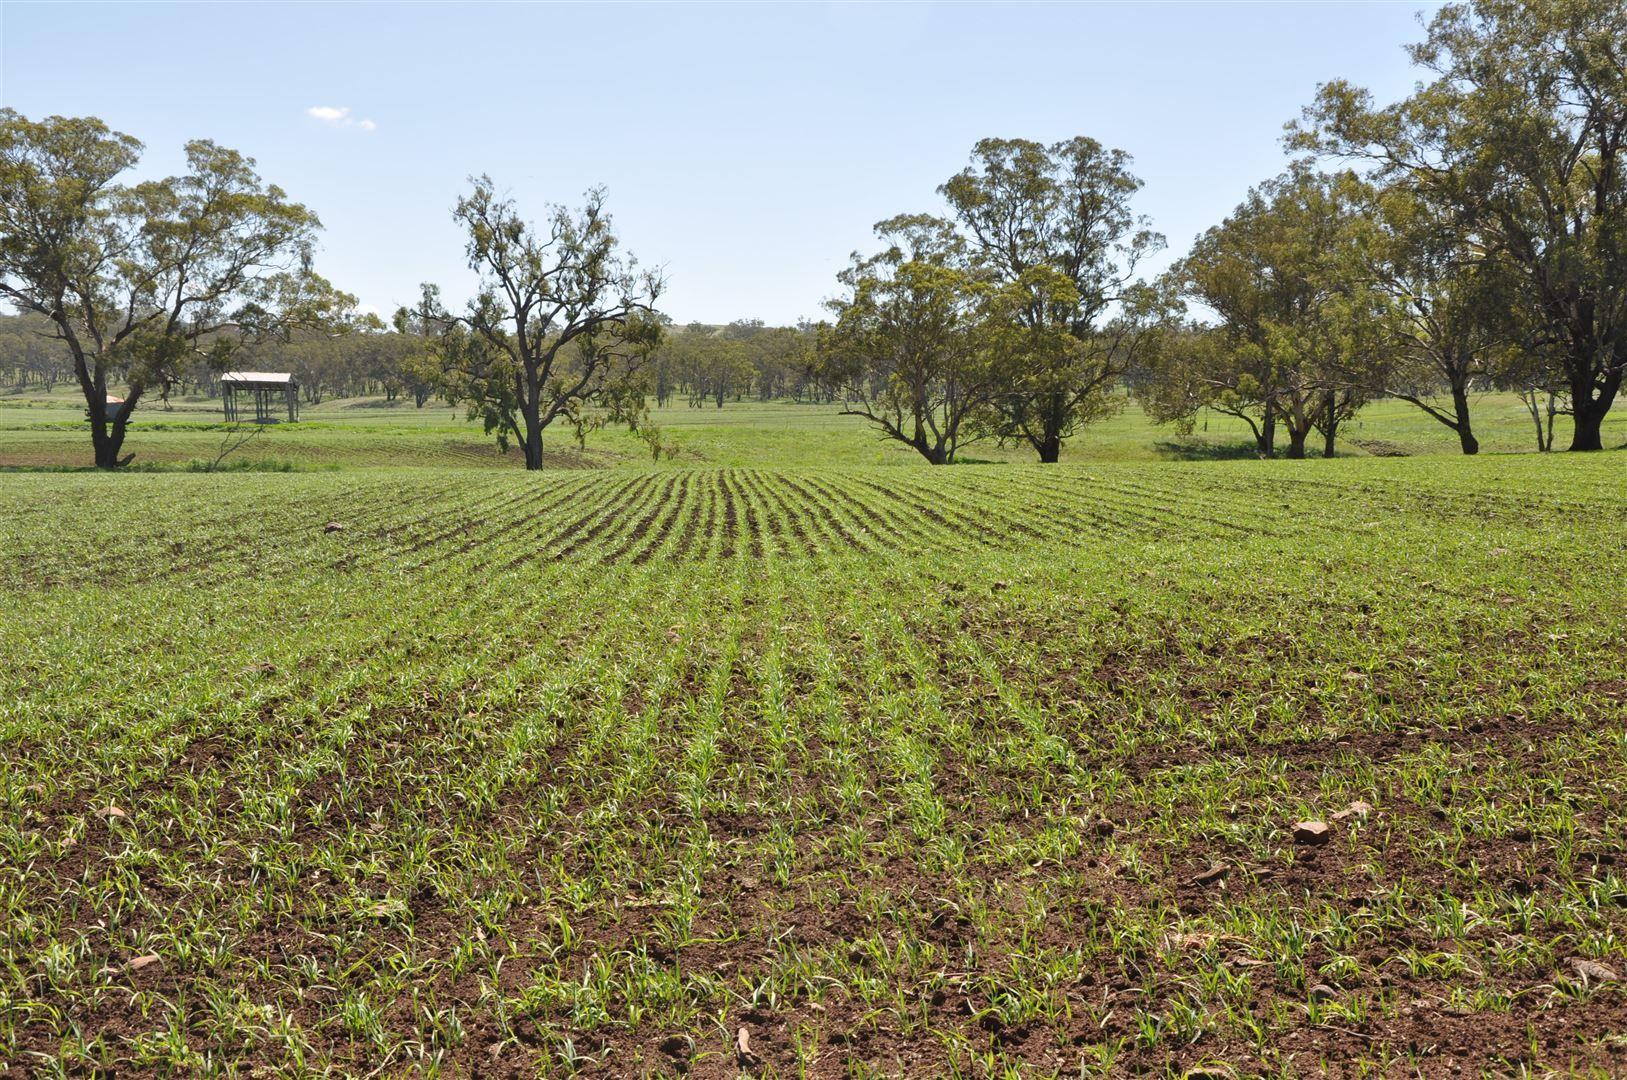 705 Coolah Rd, 'Culbara', Cassilis NSW 2329, Image 1